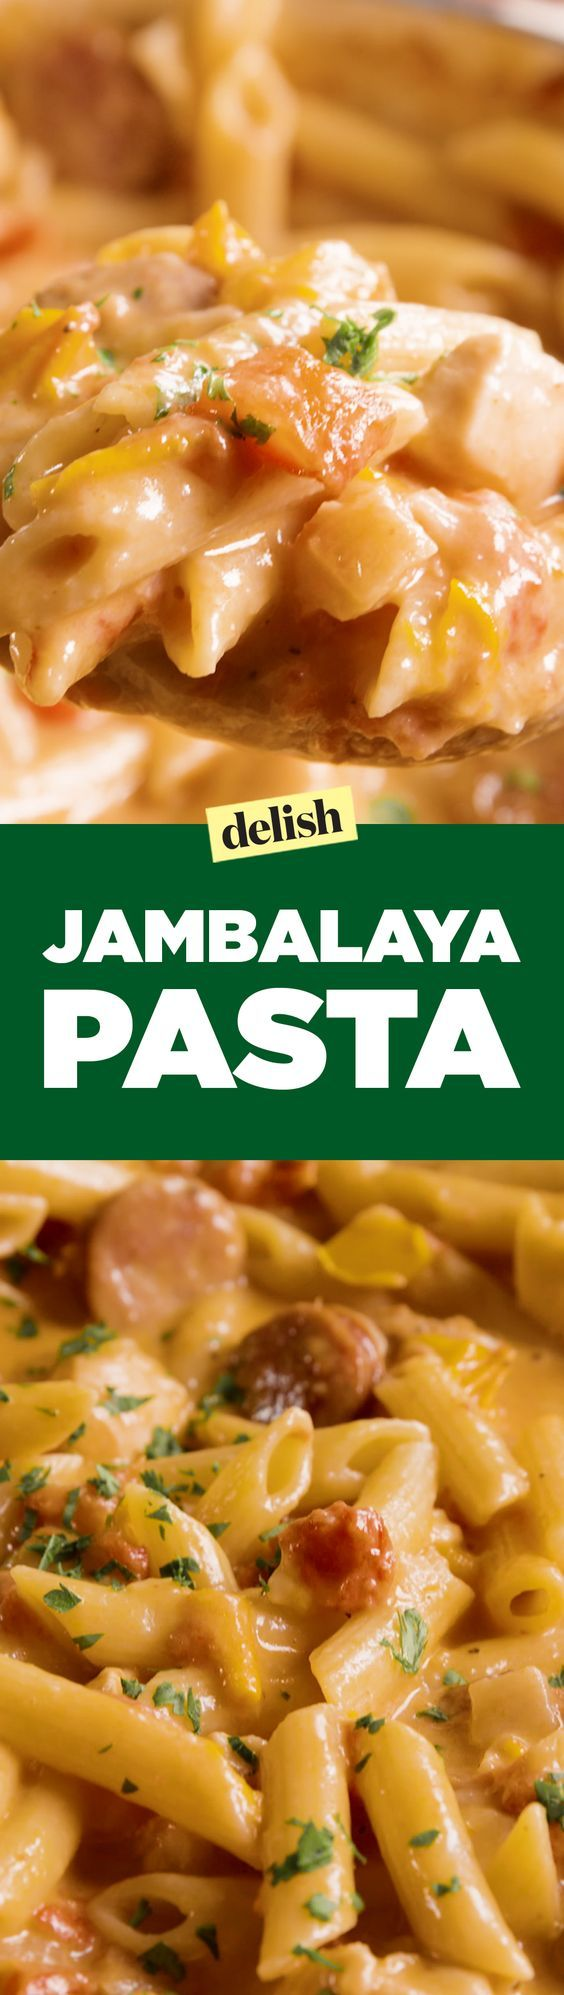 This jambalaya pasta has a kick we can't resist. Get the recipe on Delish.com.